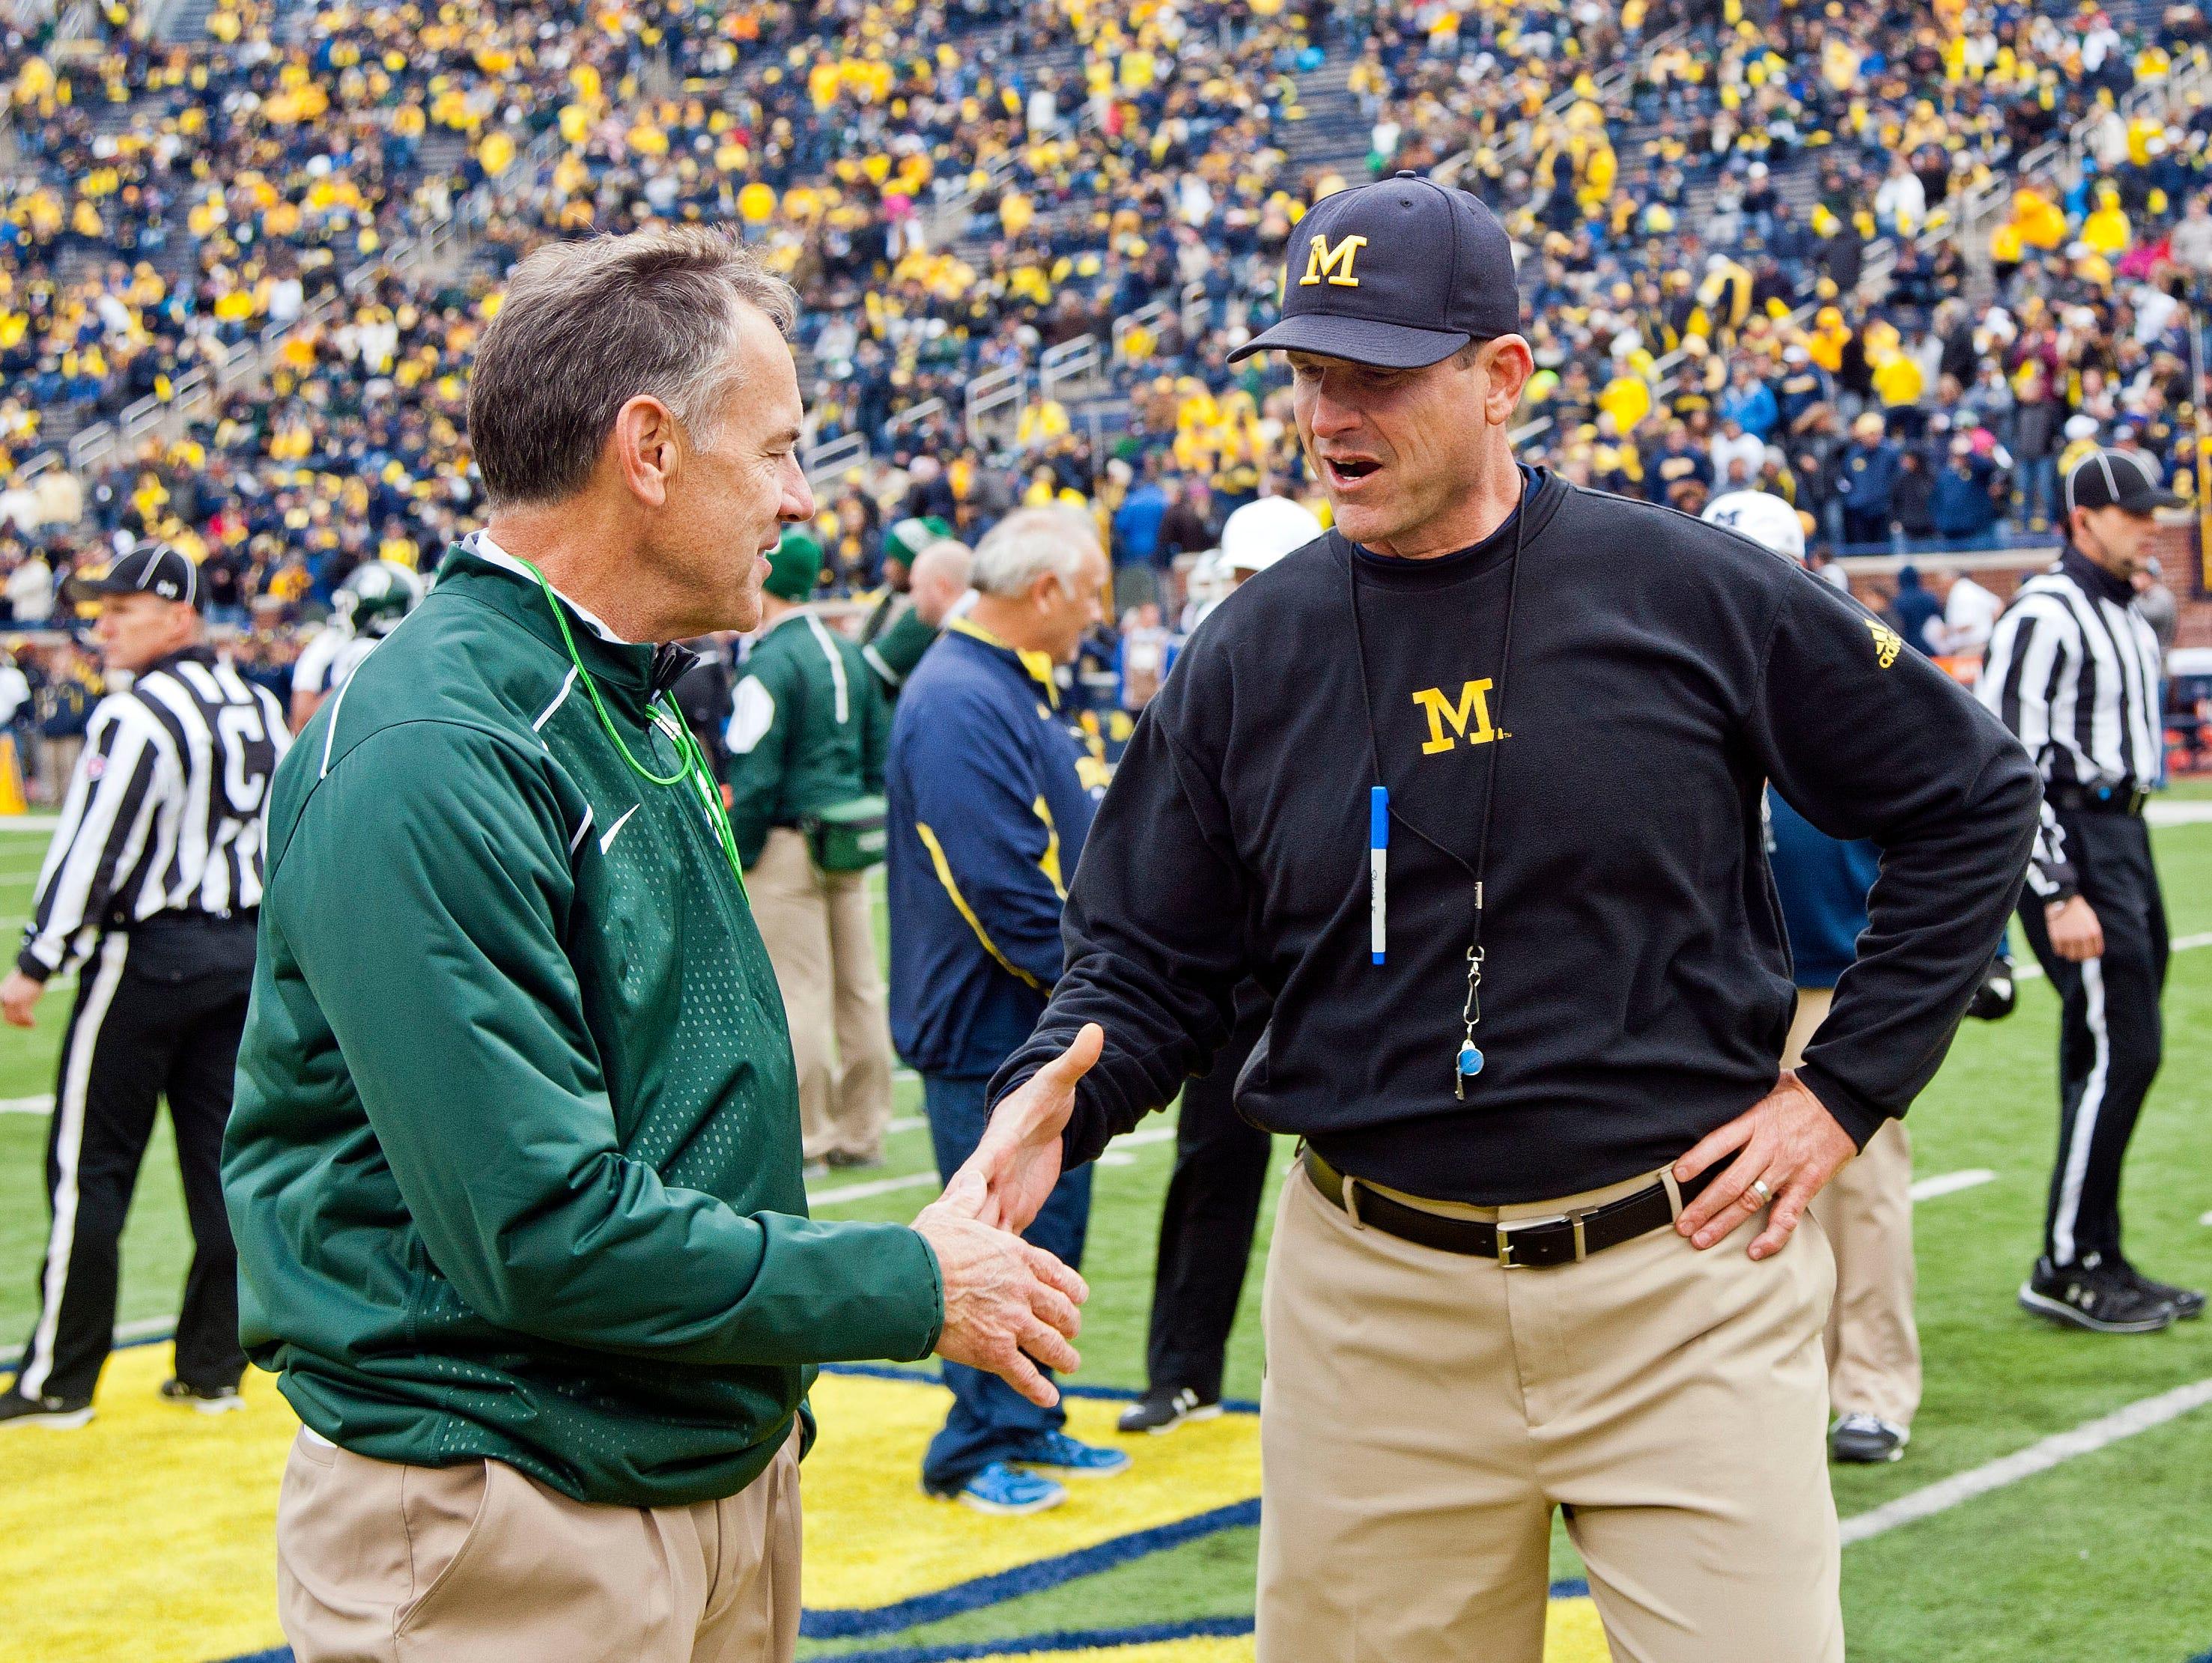 Michigan State coach Mark Dantonio shakes hands with Michigan coach Jim Harbaugh at Michigan Stadium on Oct. 17.